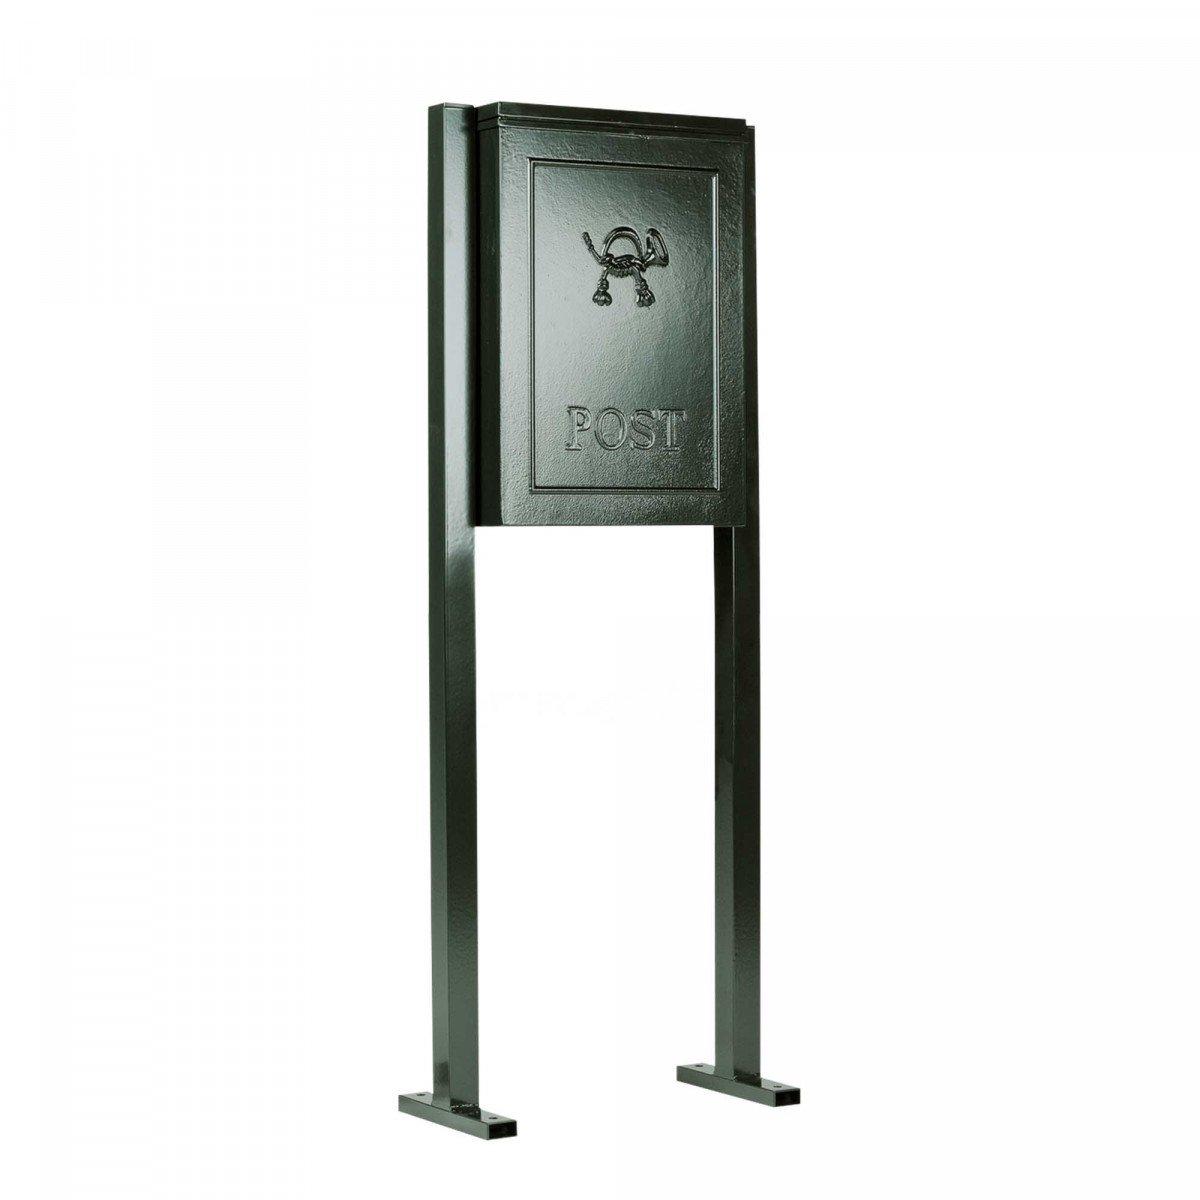 Post box in frame B9A